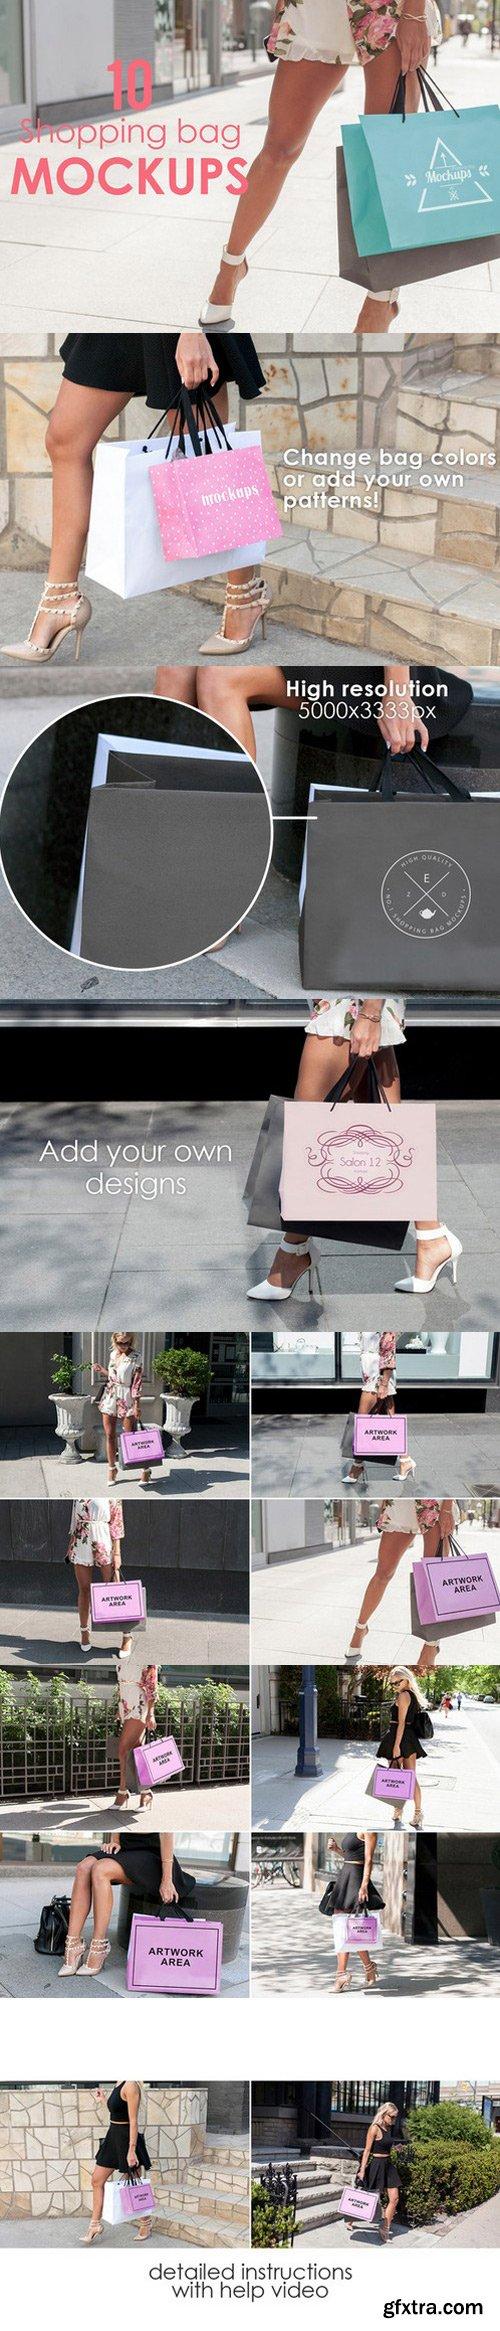 Cm 10 Ping Bag Mockups 668819